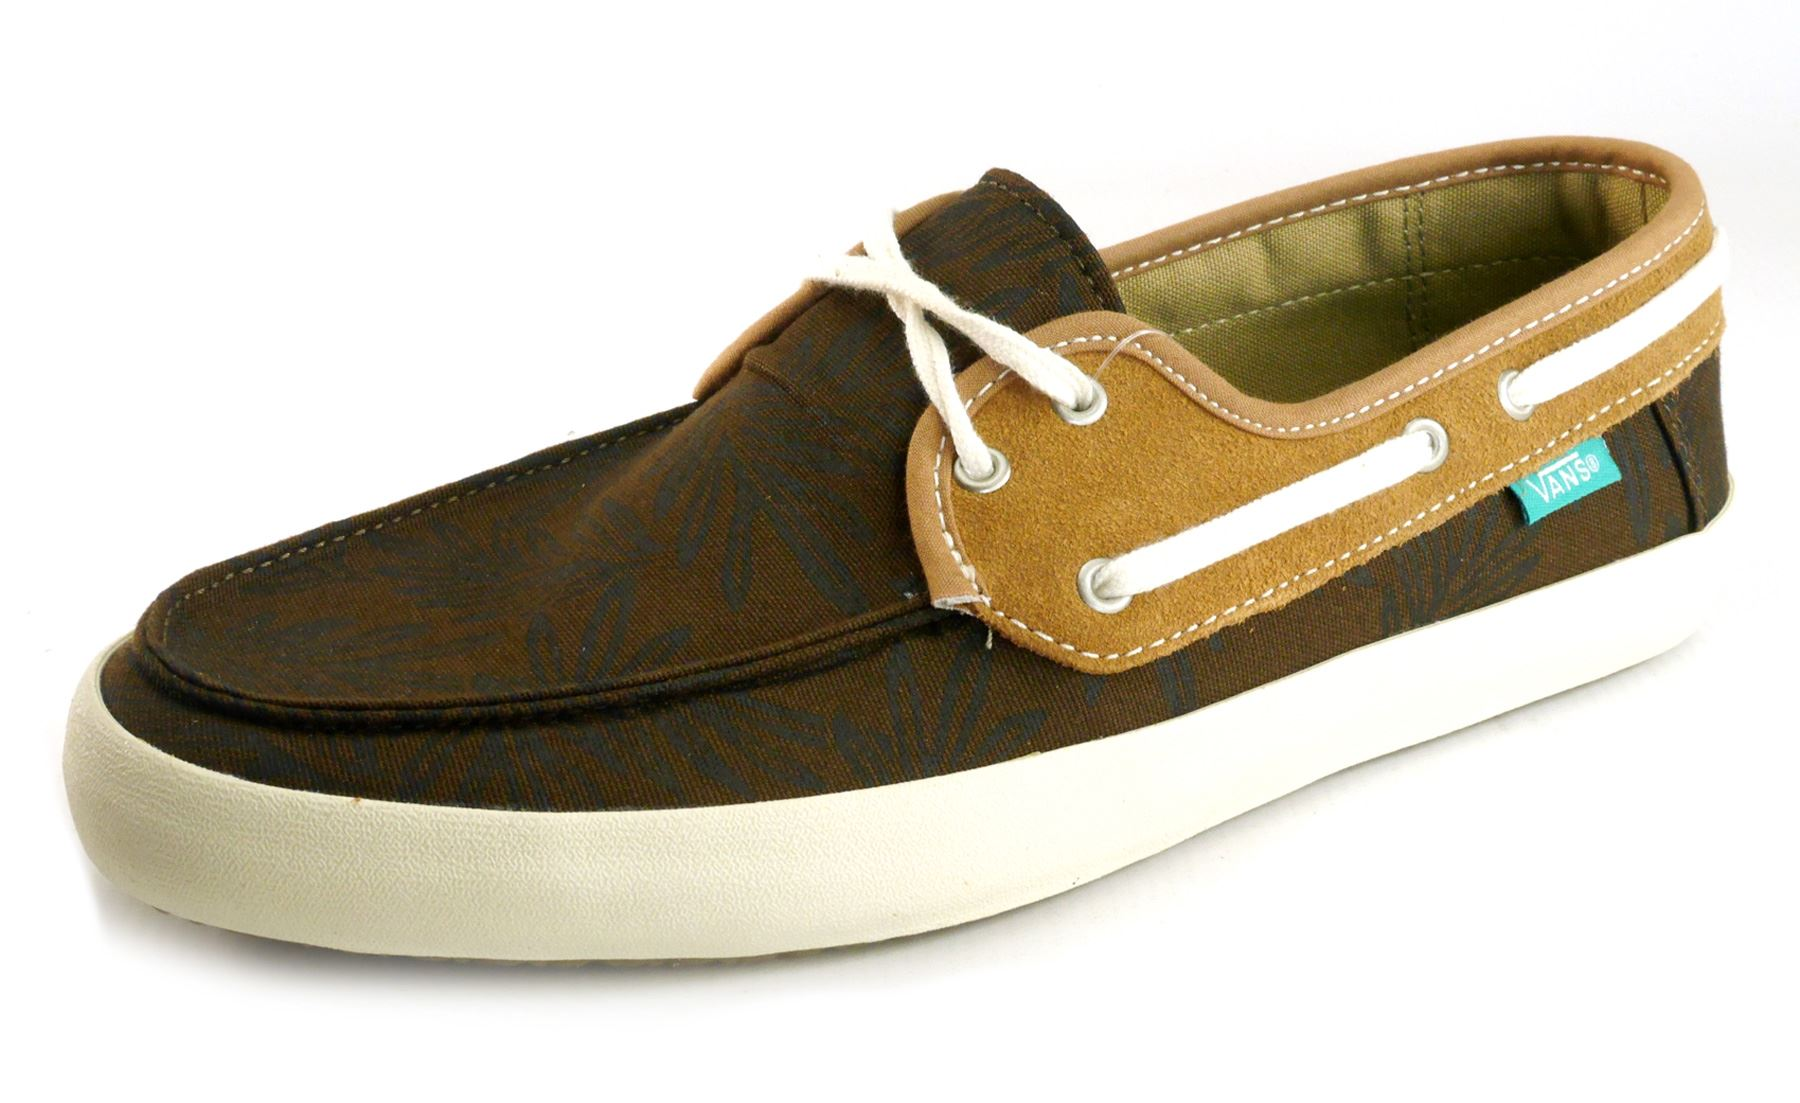 vans boat shoes brown